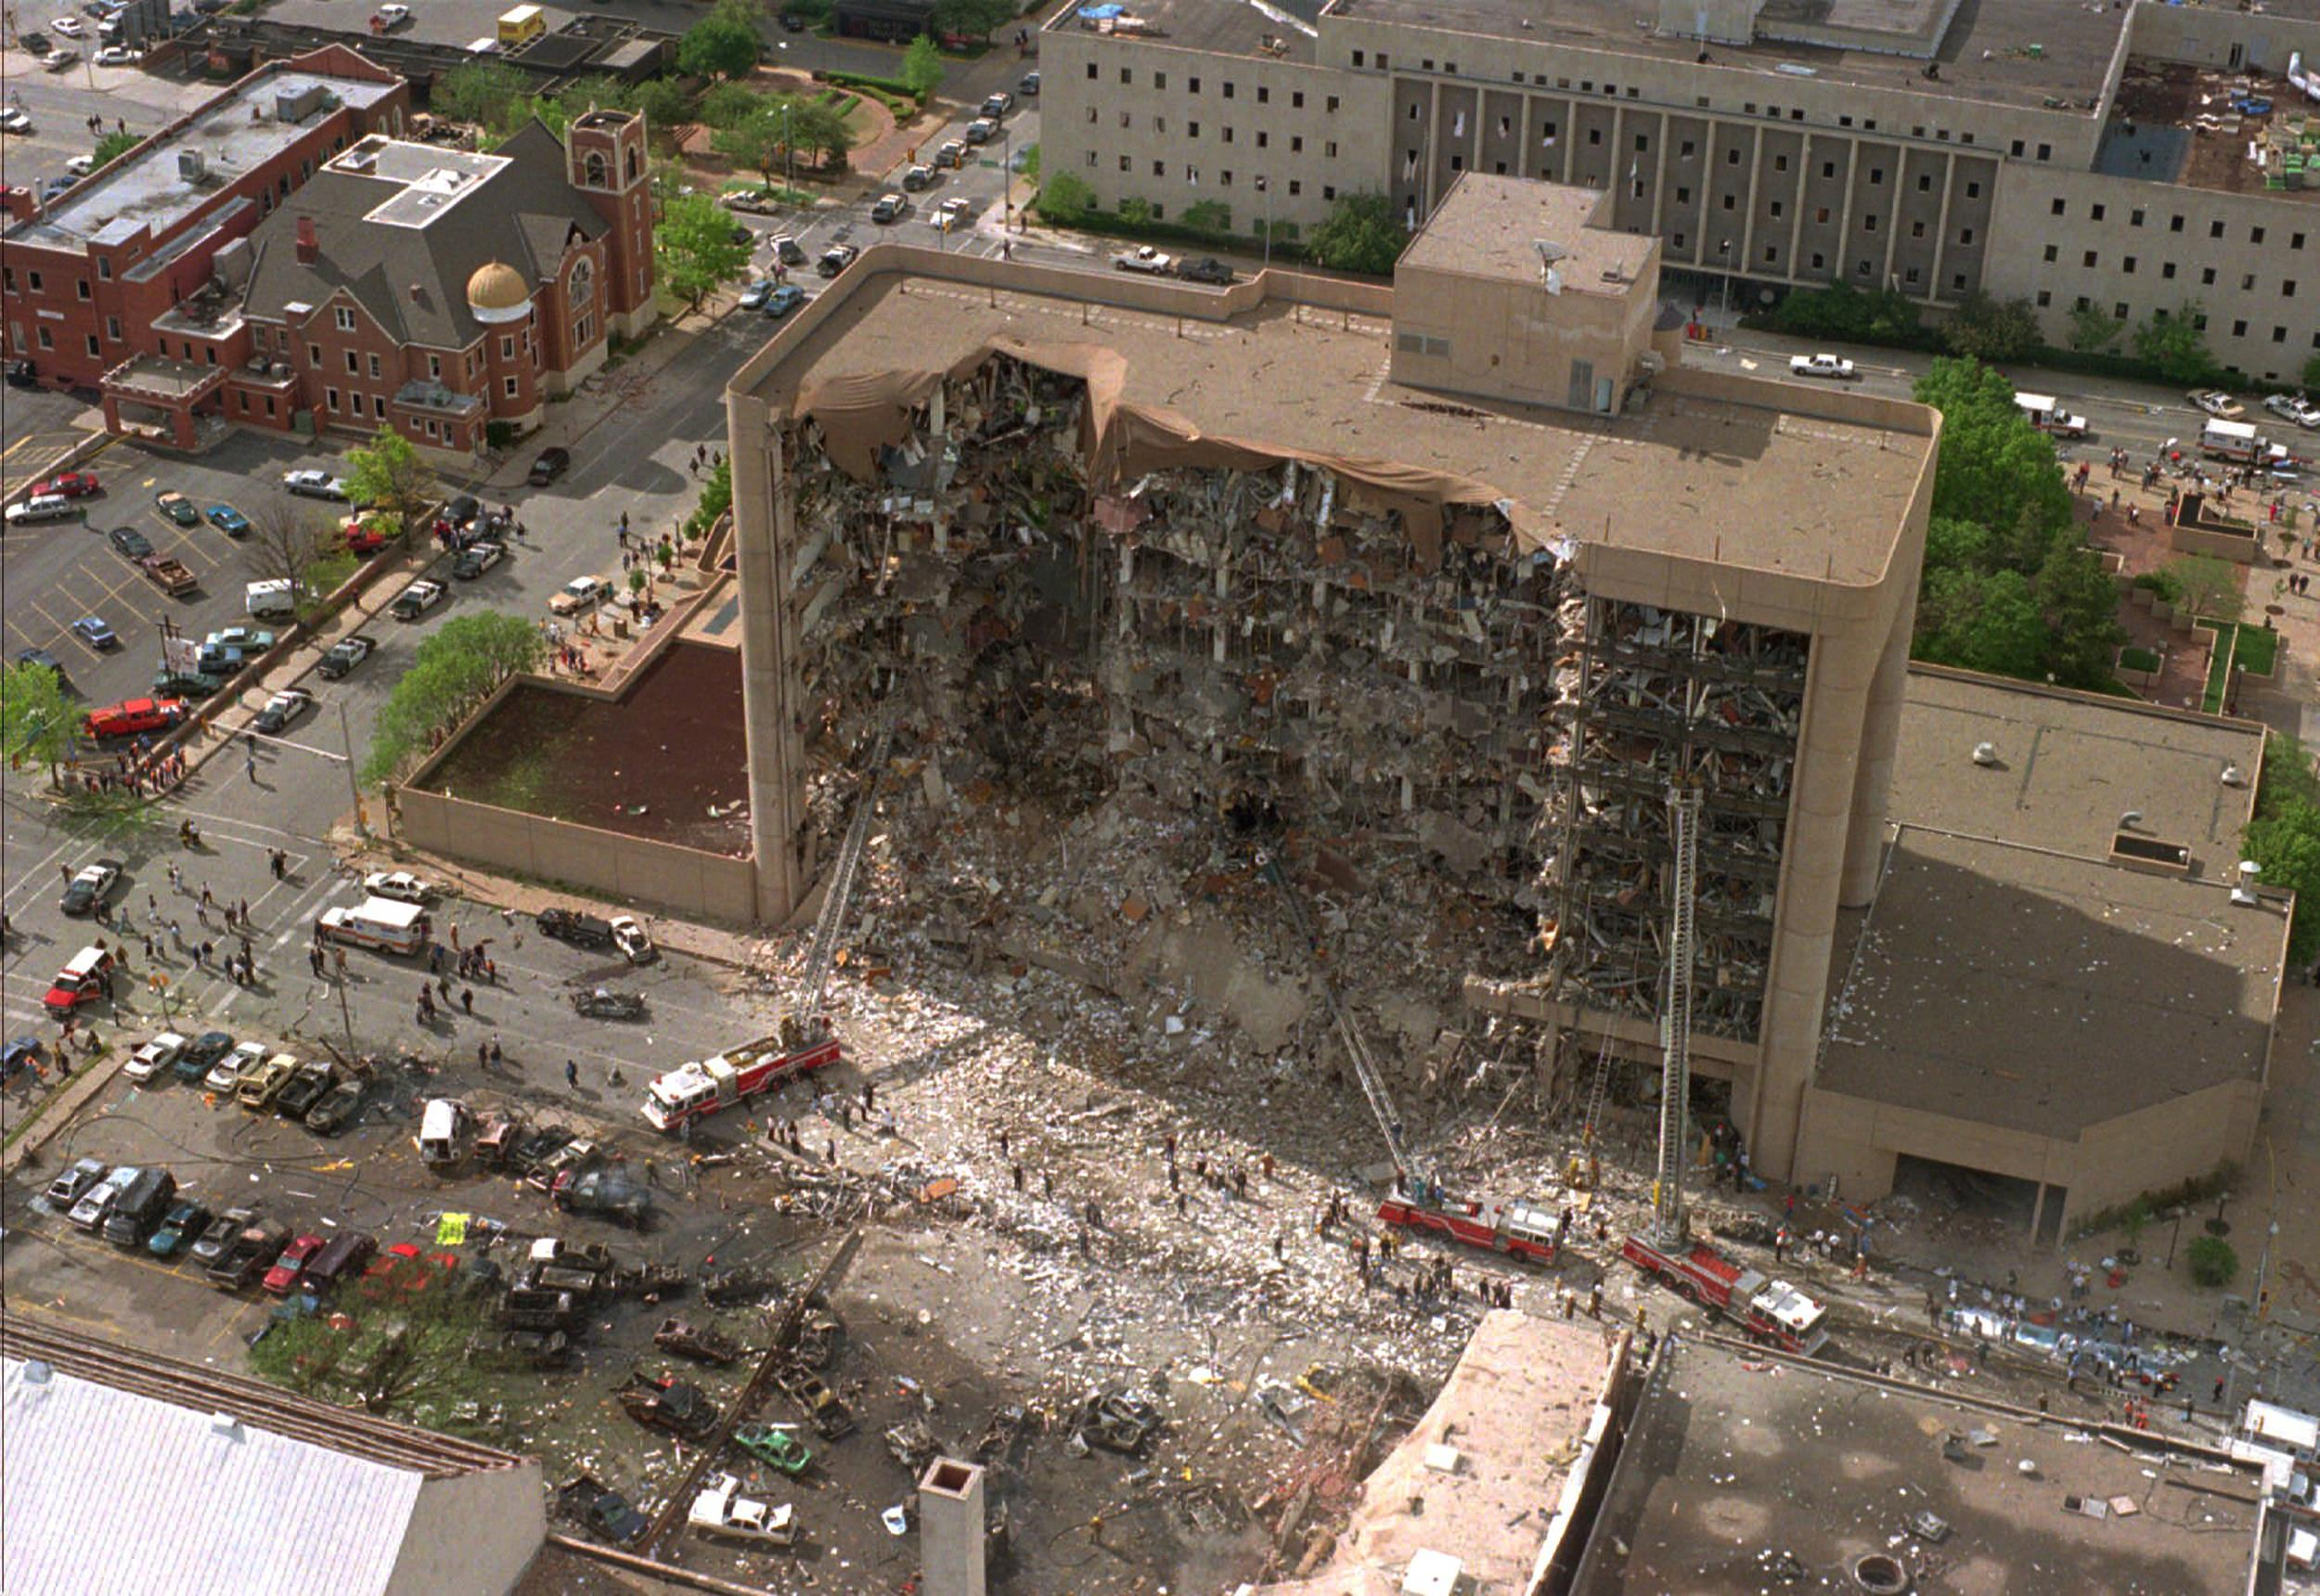 140728-oklahoma-city-bombing-1610_45ab173c206ff1f7bd239c6a42ab9cff.jpg